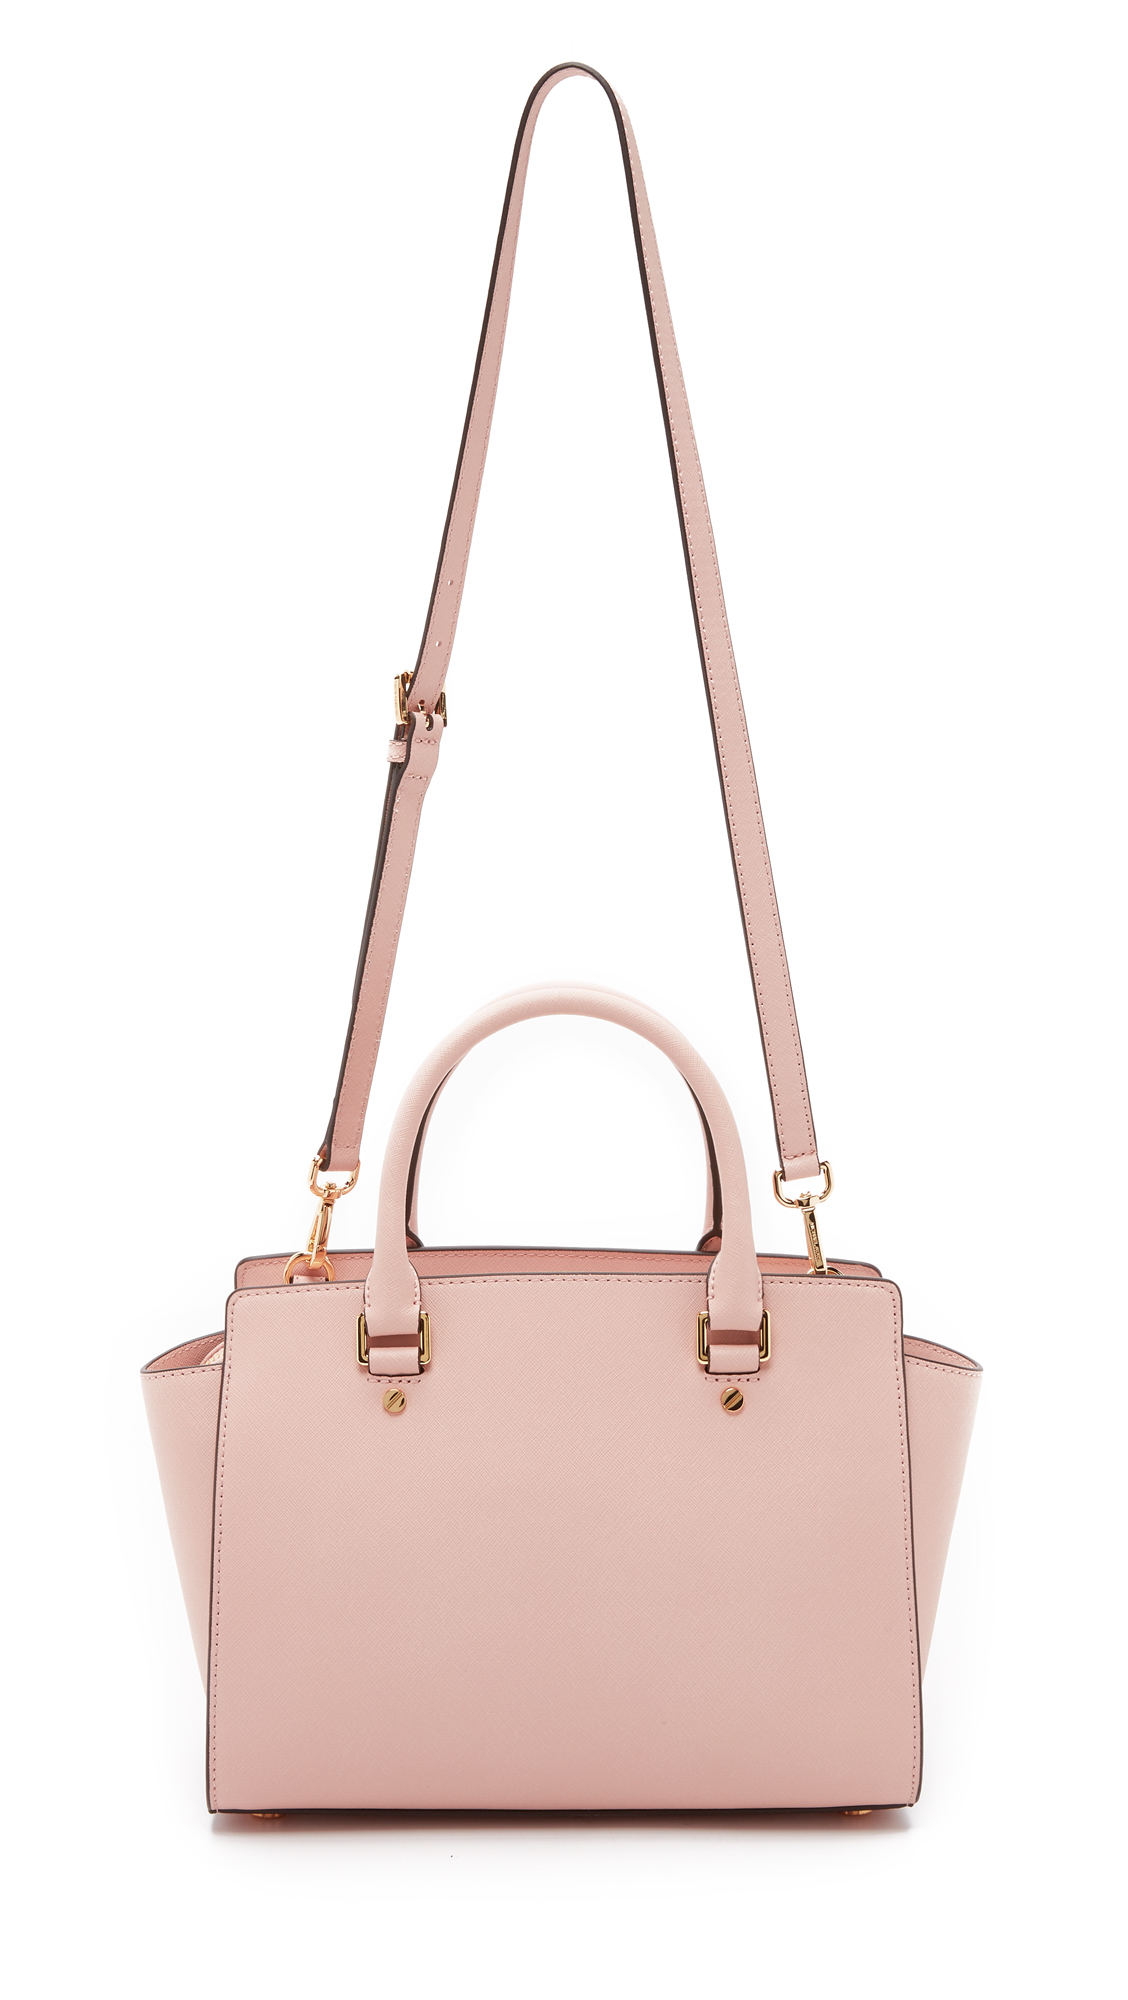 0cbcb18b2b ... france lyst michael michael kors selma medium satchel ballet in pink  b2b5c e5fb4